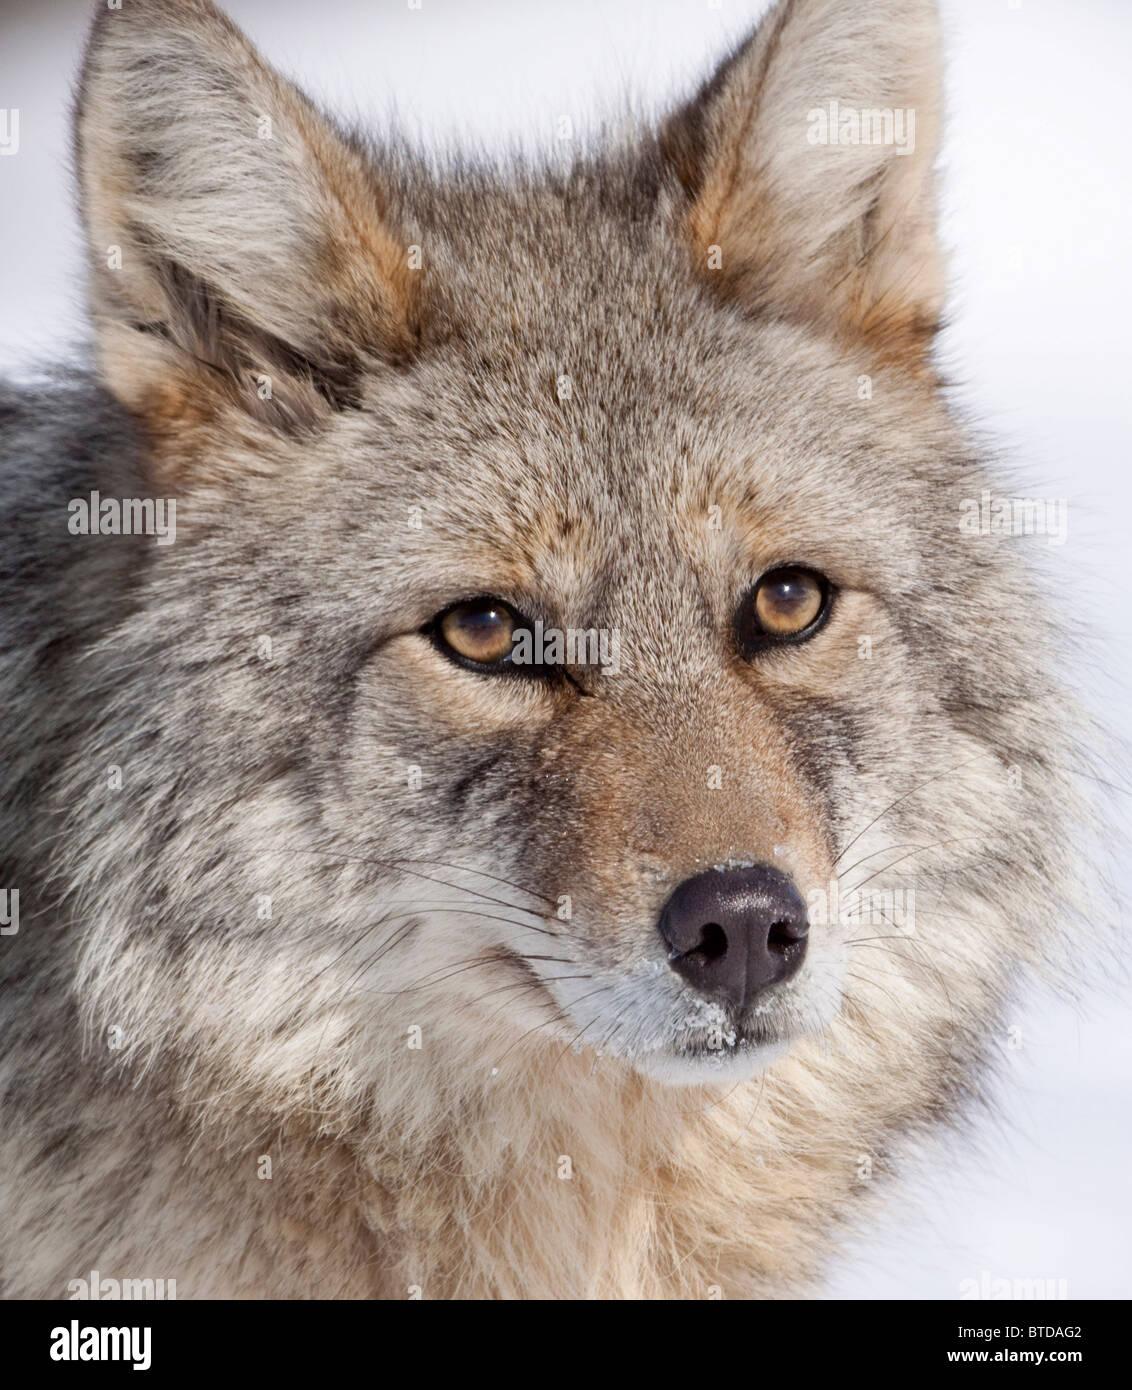 Portrait of a wild Coyote near the Alaska Wildlife Conservation Center, Southcentral Alaska, Winter - Stock Image